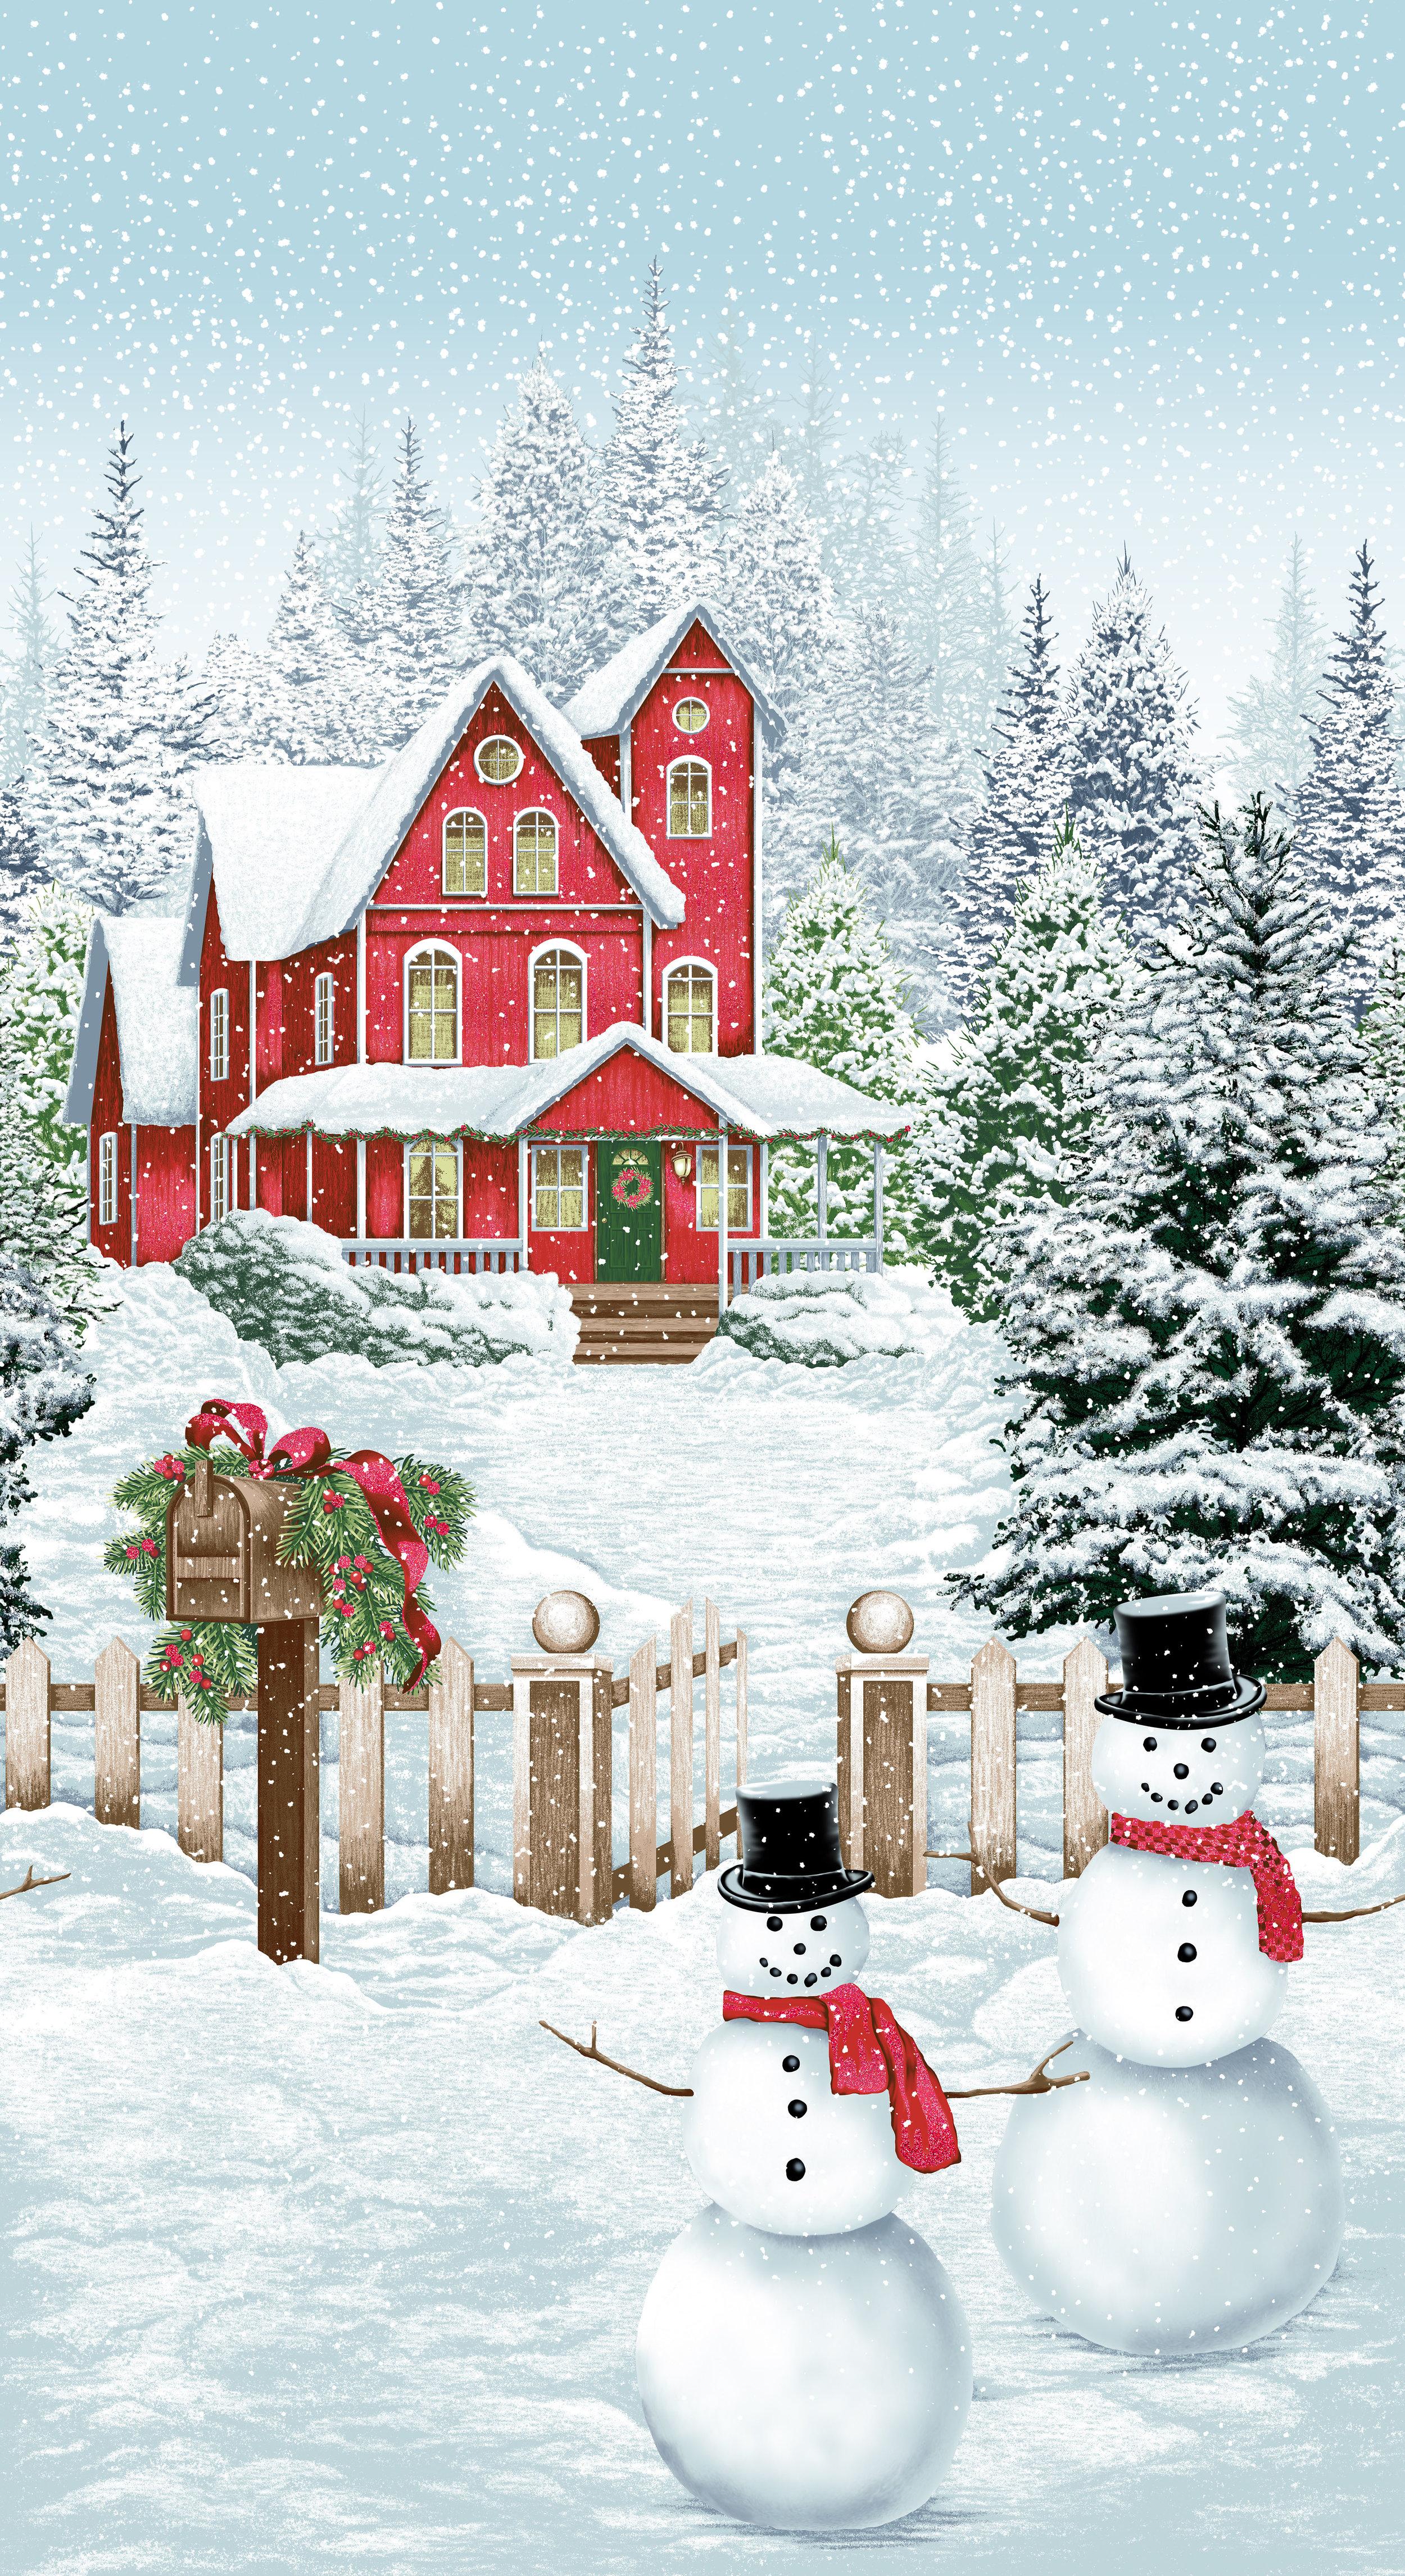 3165-001 SNOW DAY-DECEMBER